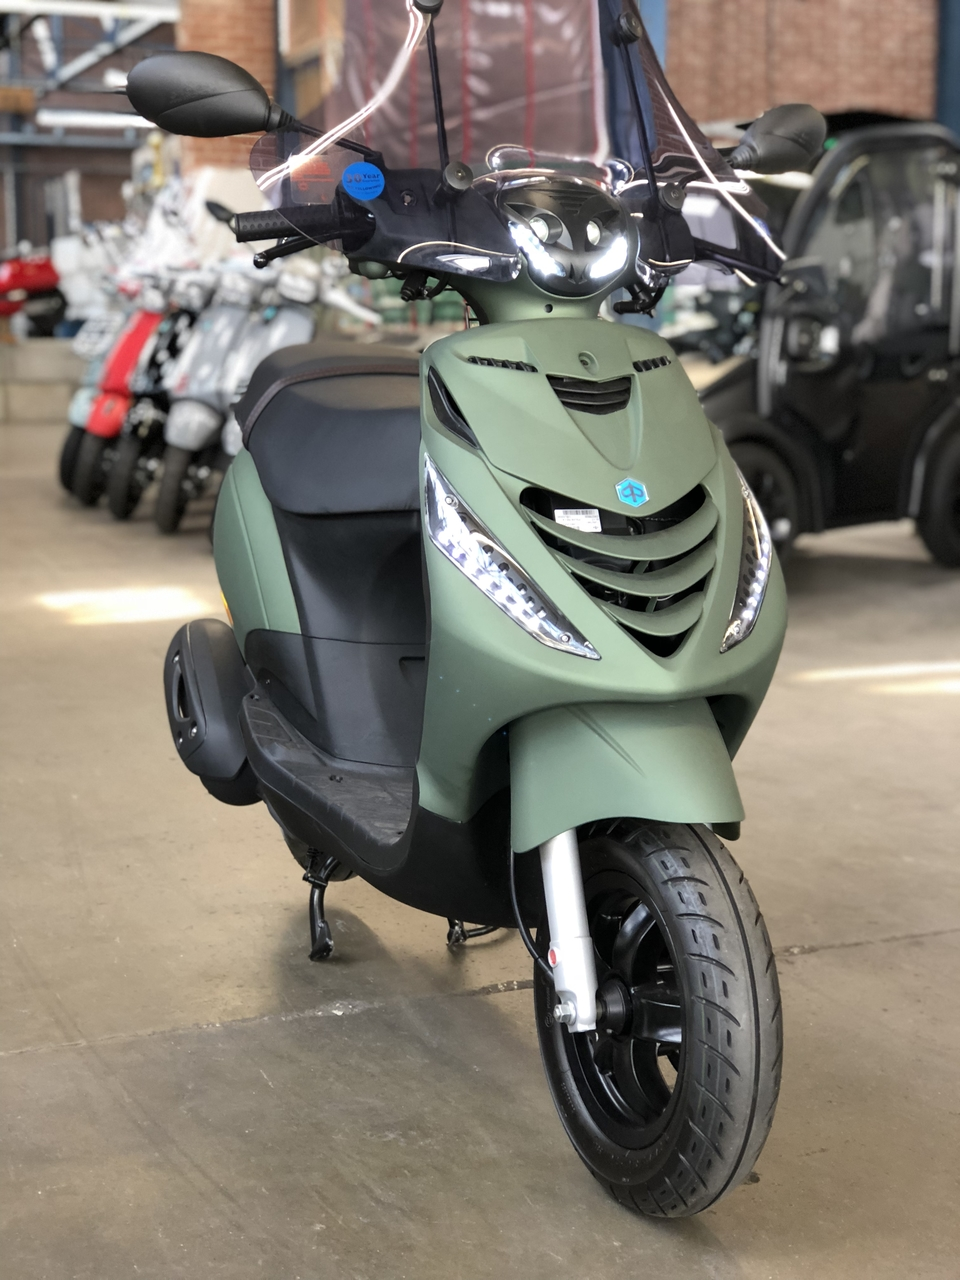 Custom Piaggio Zip Sp Matgroen 25kmu